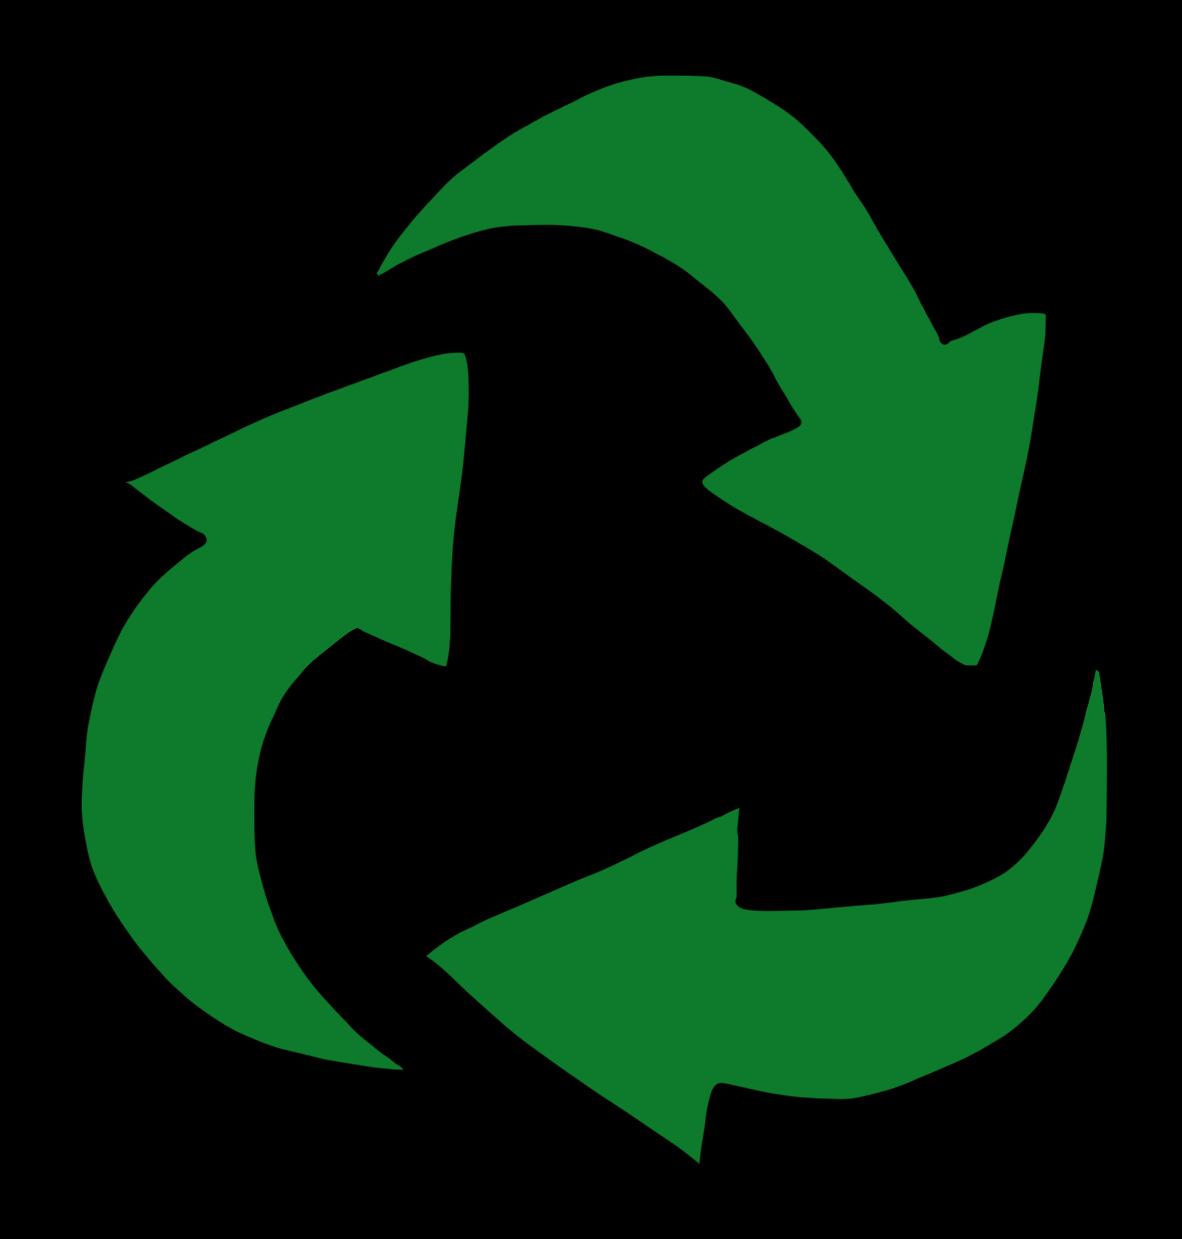 Earth heart clipart jpg royalty free stock Recycle arrow clipart - ClipartFest jpg royalty free stock